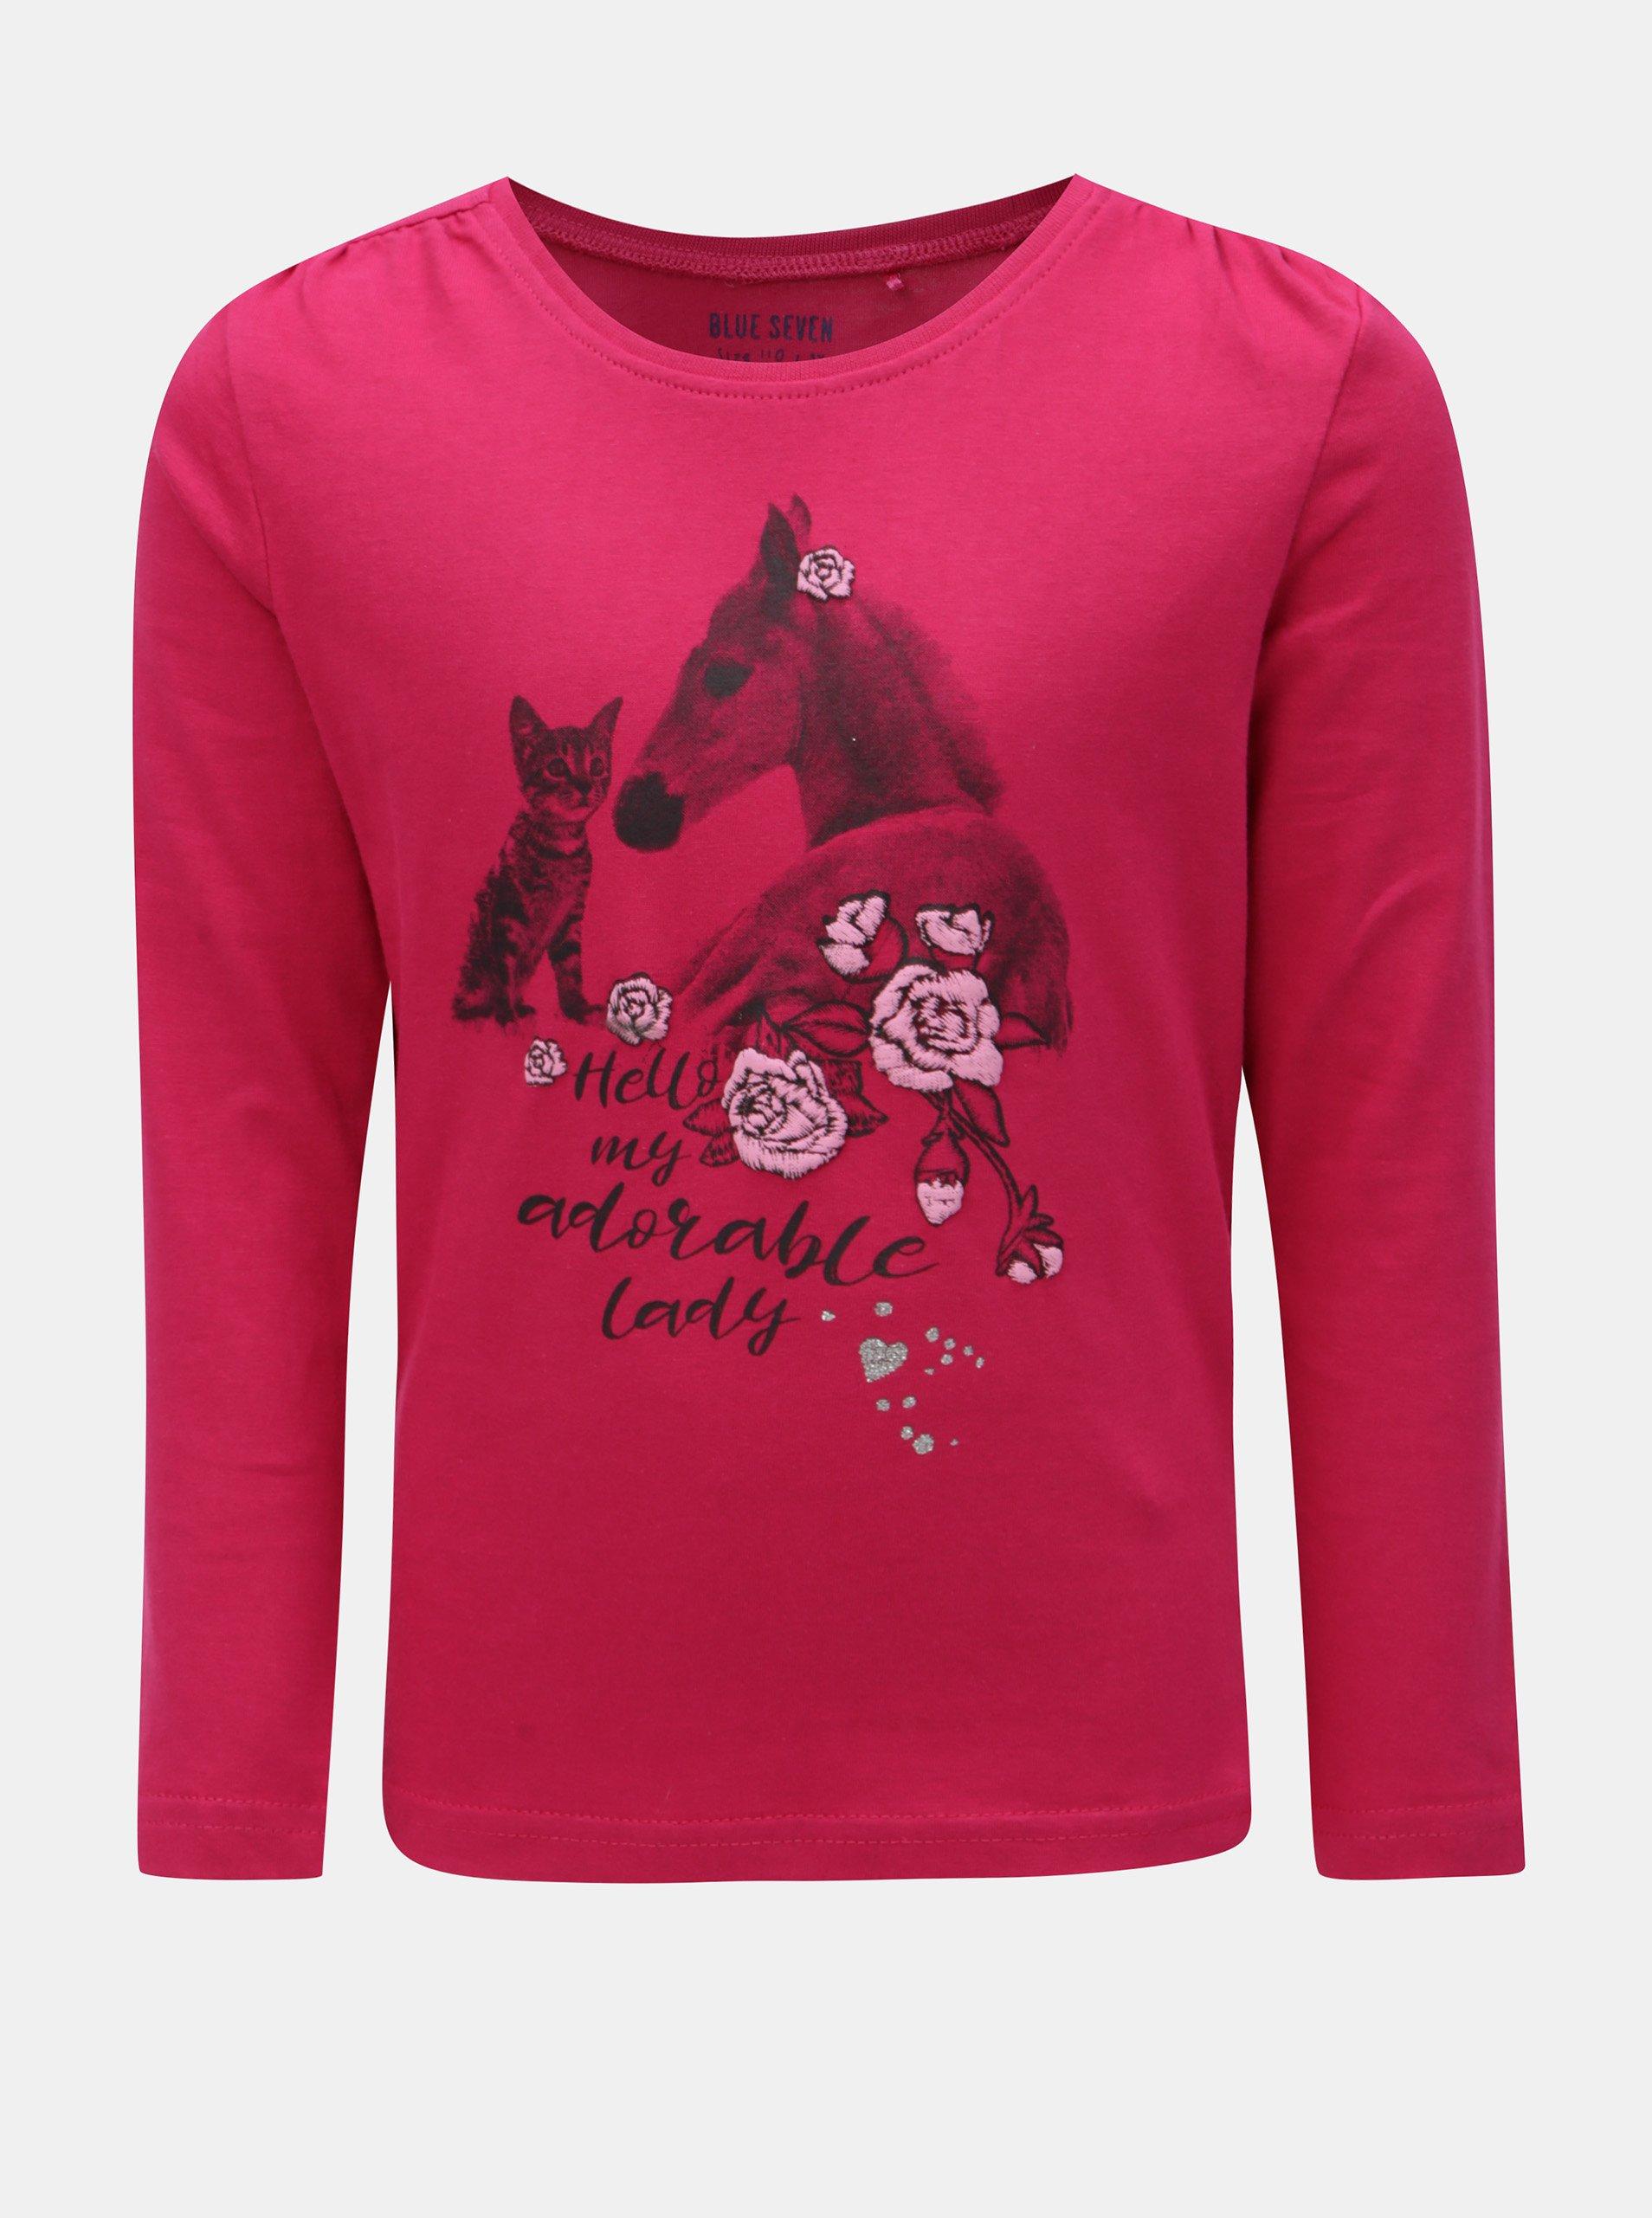 Tmavoružové dievčenské tričko s potlačou koňa Blue Seven  922d07c4c3d